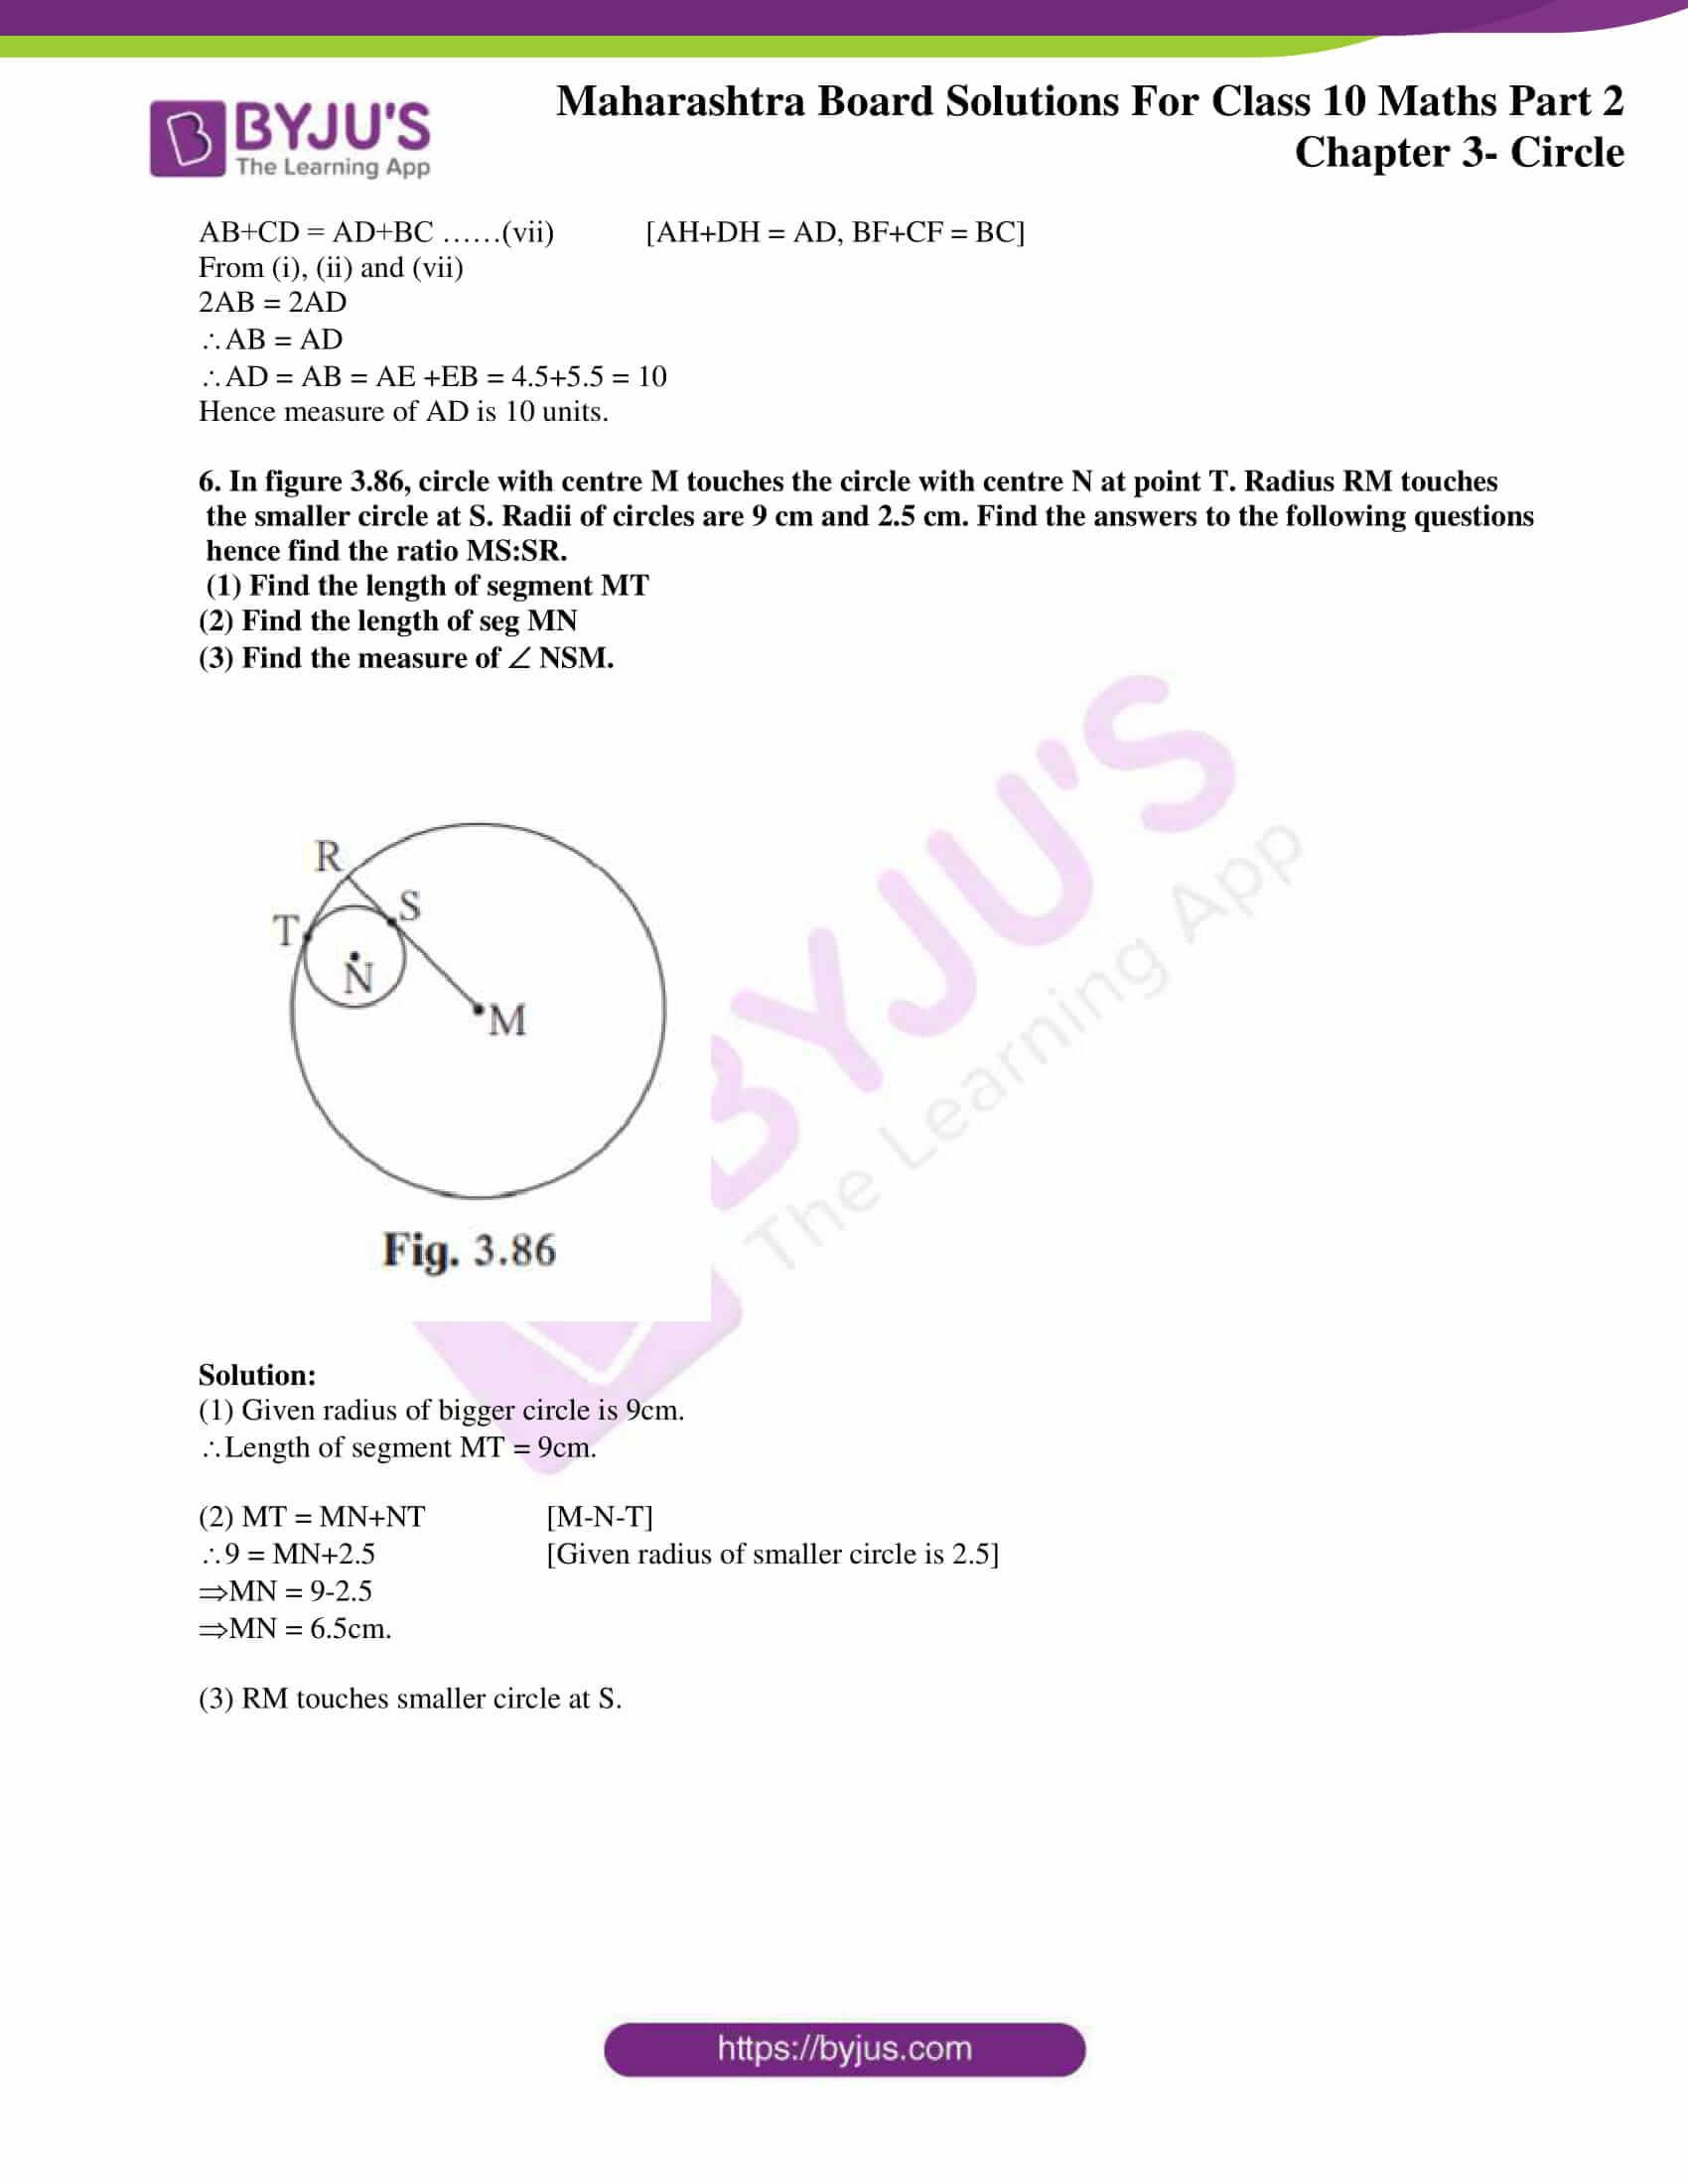 msbshse sol class 10 maths part 2 chapter 3 24